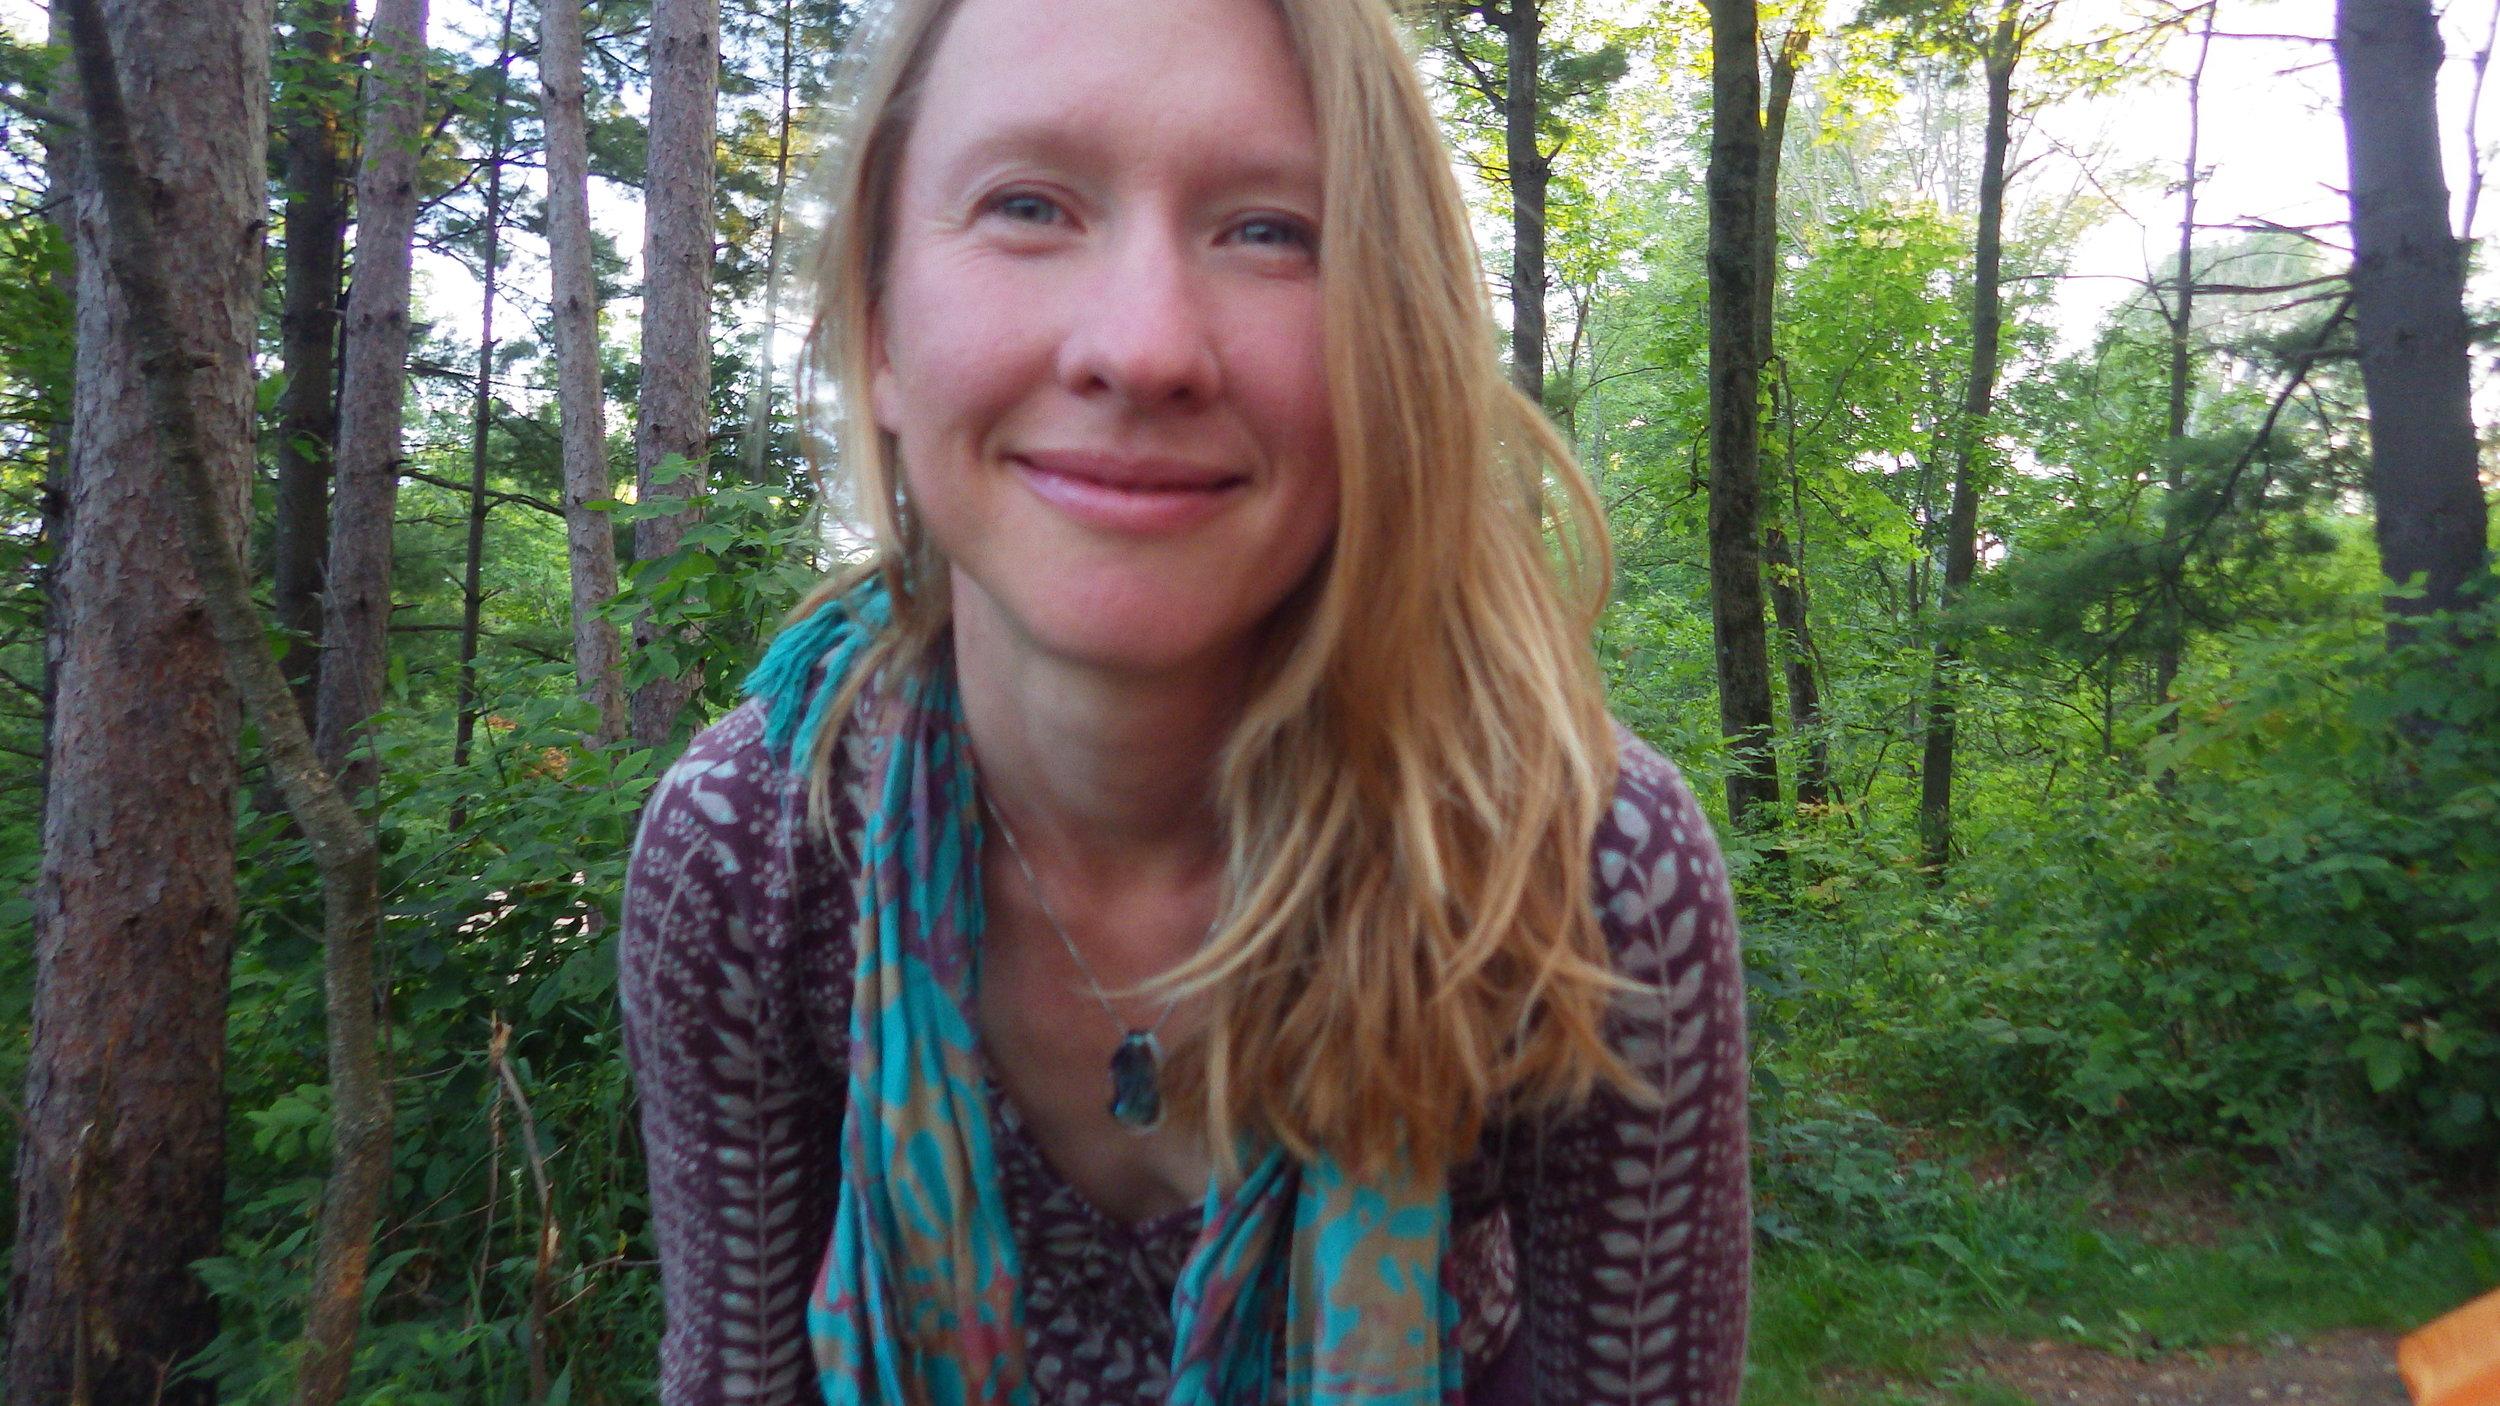 Photo taken by my daughter, Nanka Thimmesch, back when she was 7,